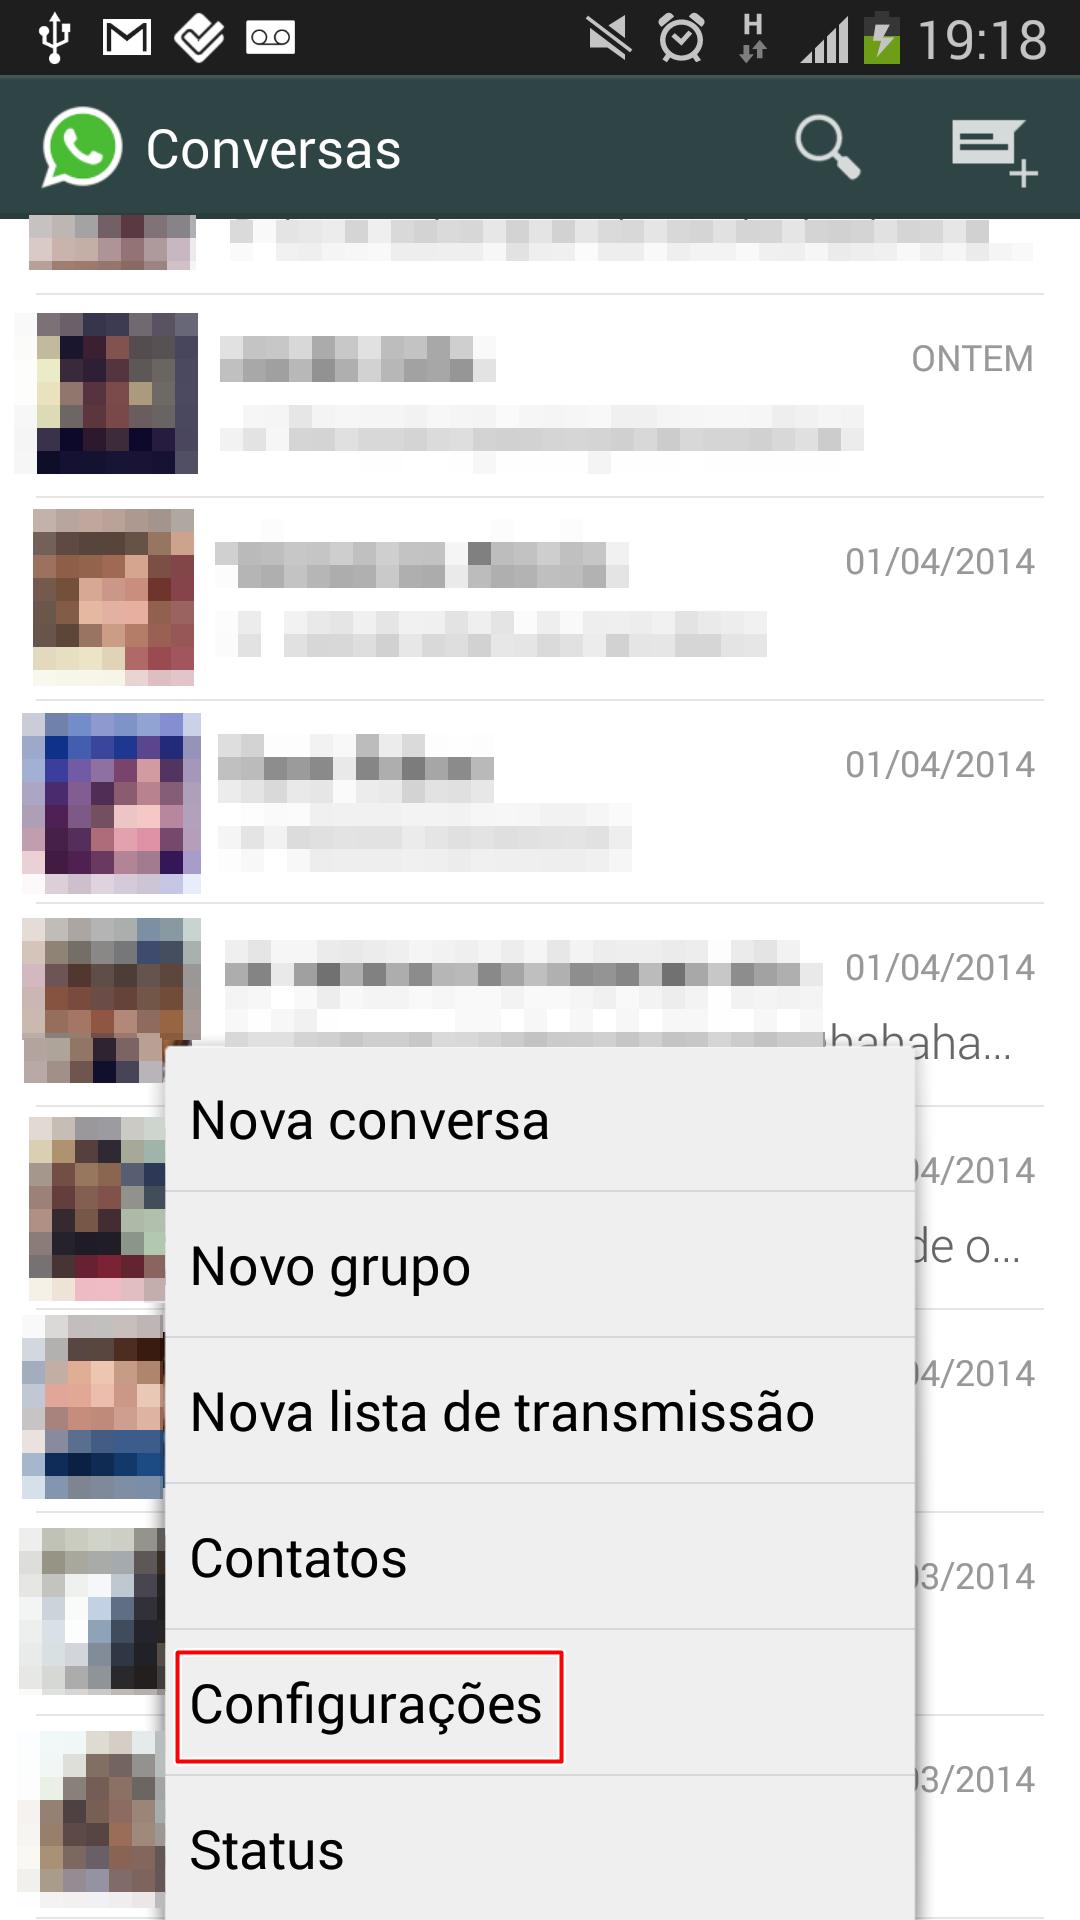 como nao salvar fotos do whatsapp no iphone